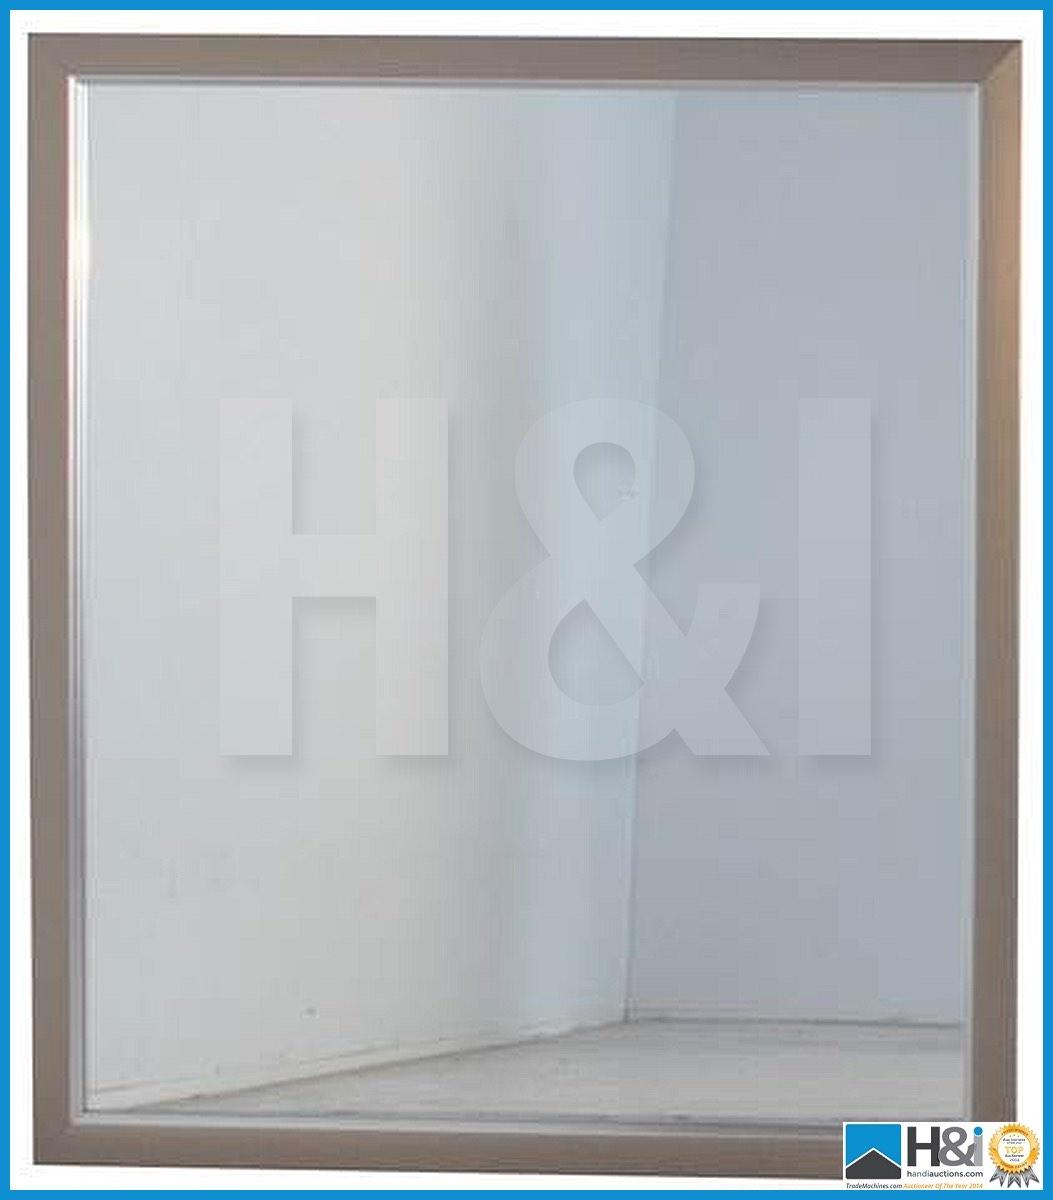 Lot 16 - Stunning black walnut bedroom furniture set comprising: 2-door wardrobe - H 193cm x W 110cm